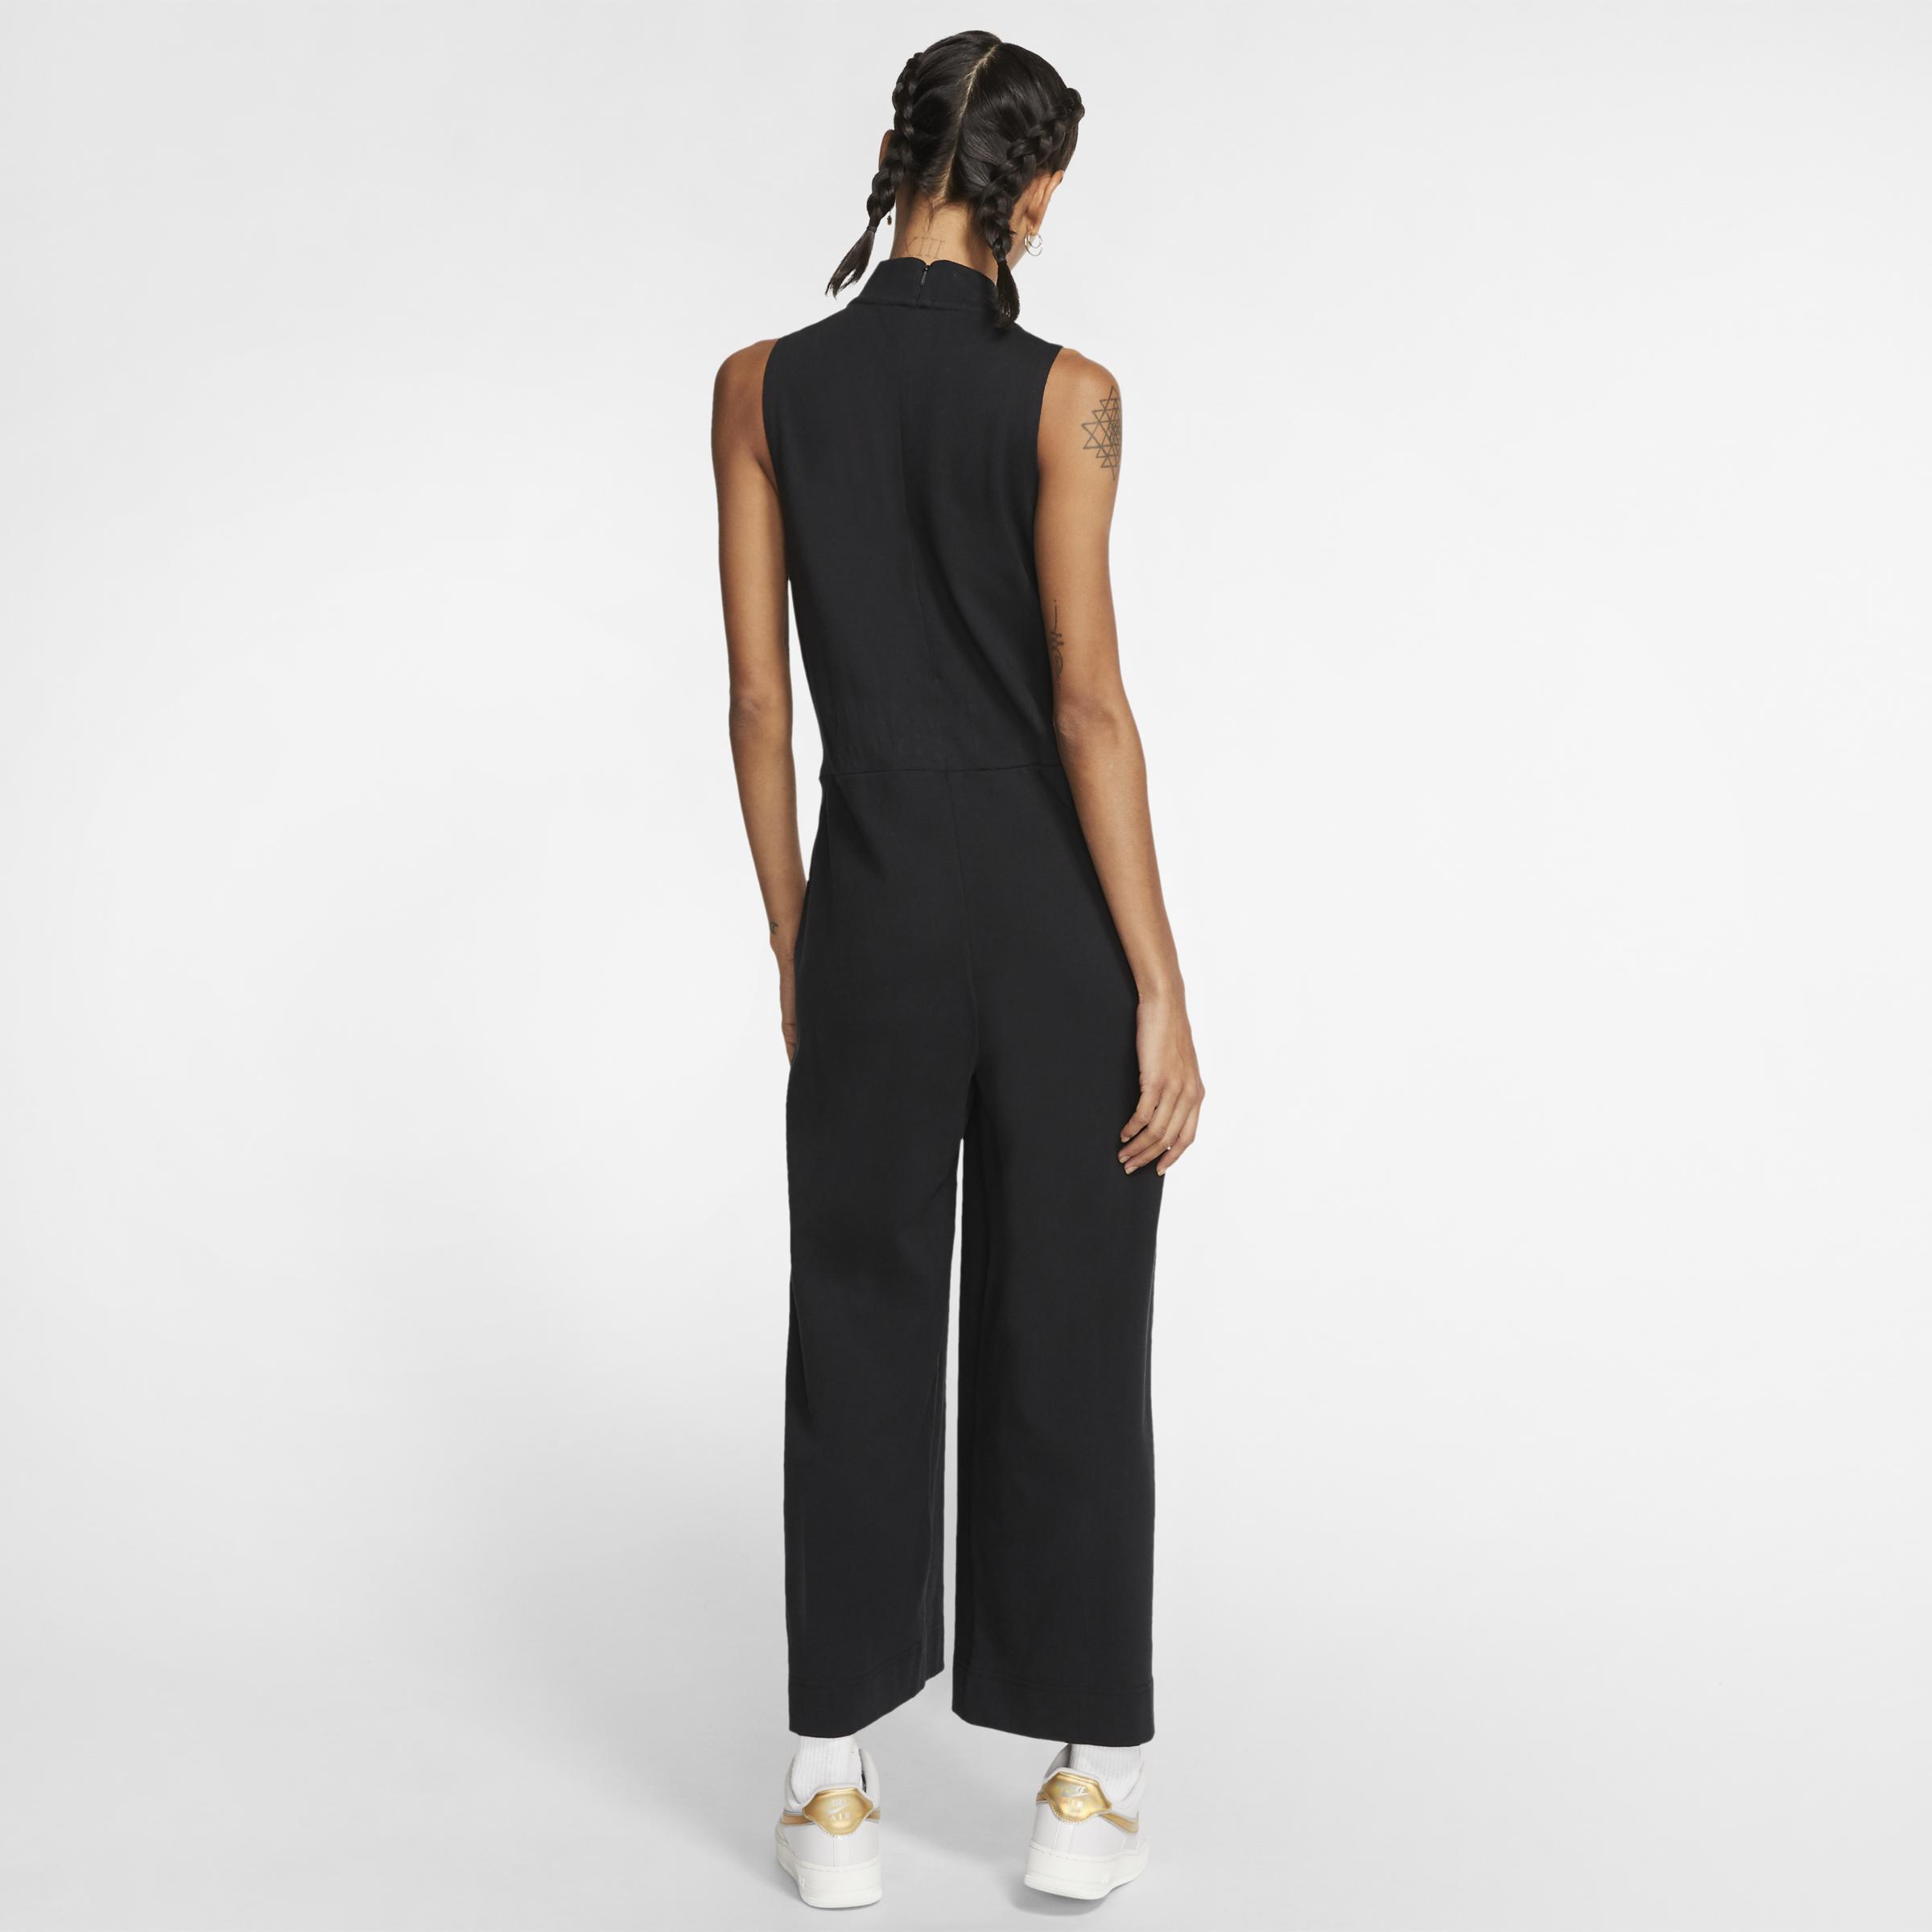 Combinaison en jersey Sportswear pour Nike en coloris Noir